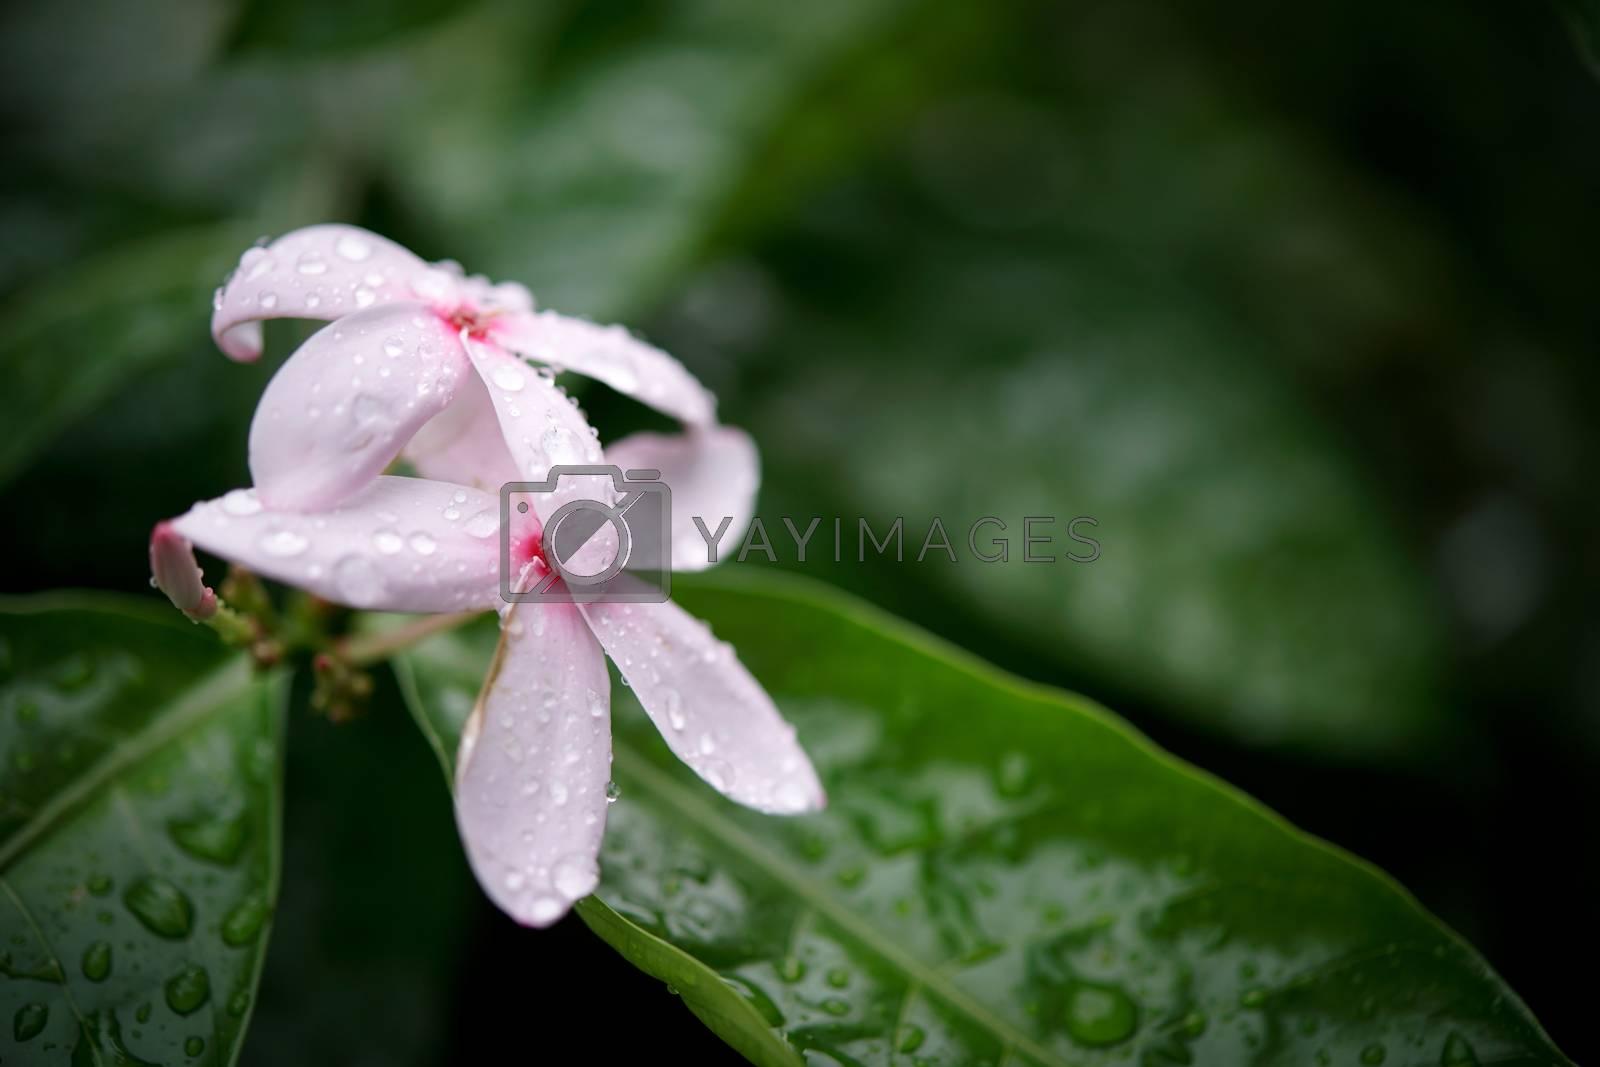 Royalty free image of pink kopsia flowers by antpkr